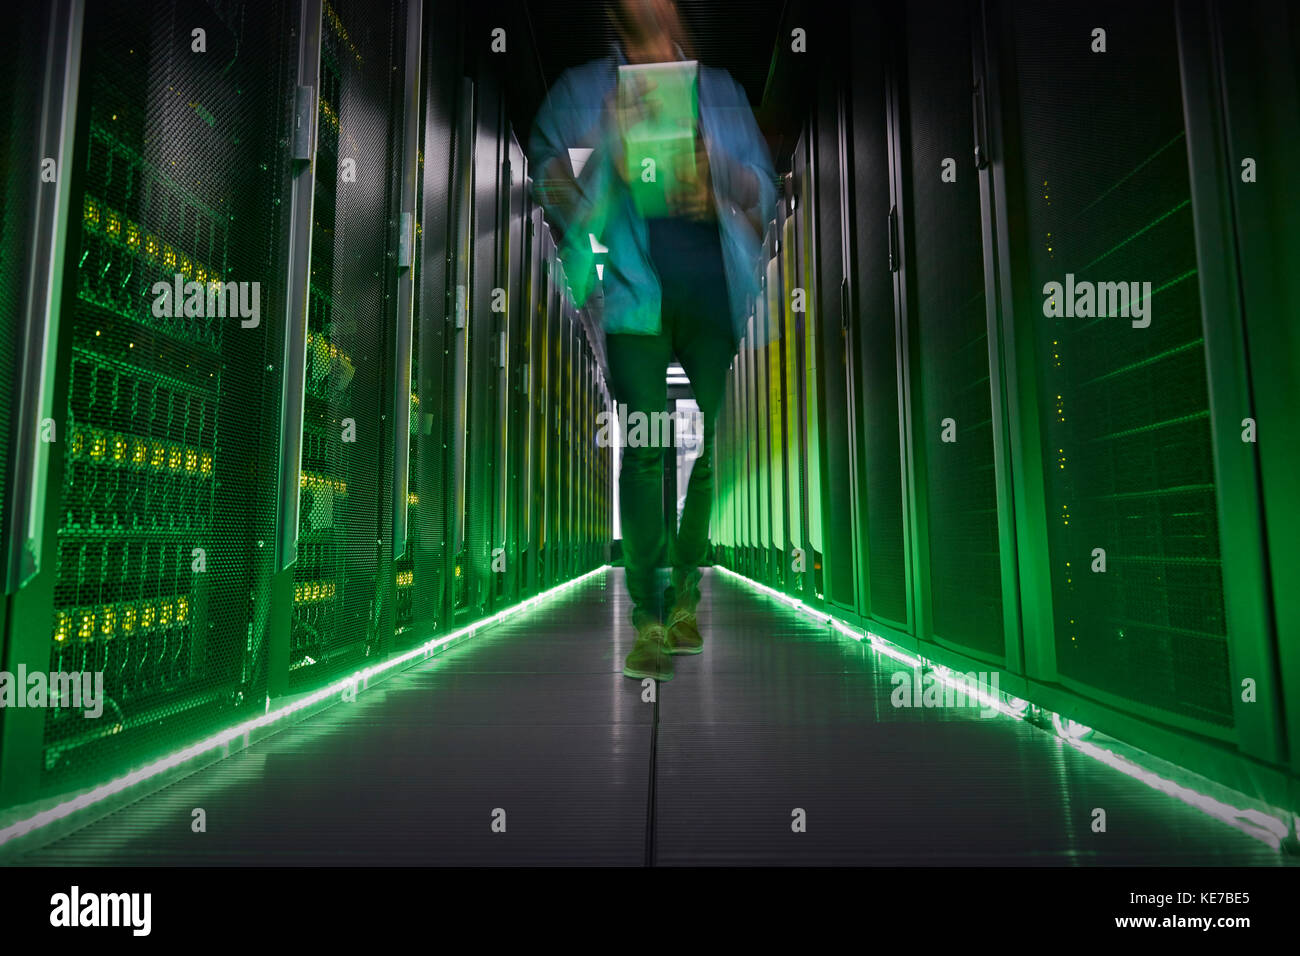 IT technician walking in dark, glowing server room - Stock Image